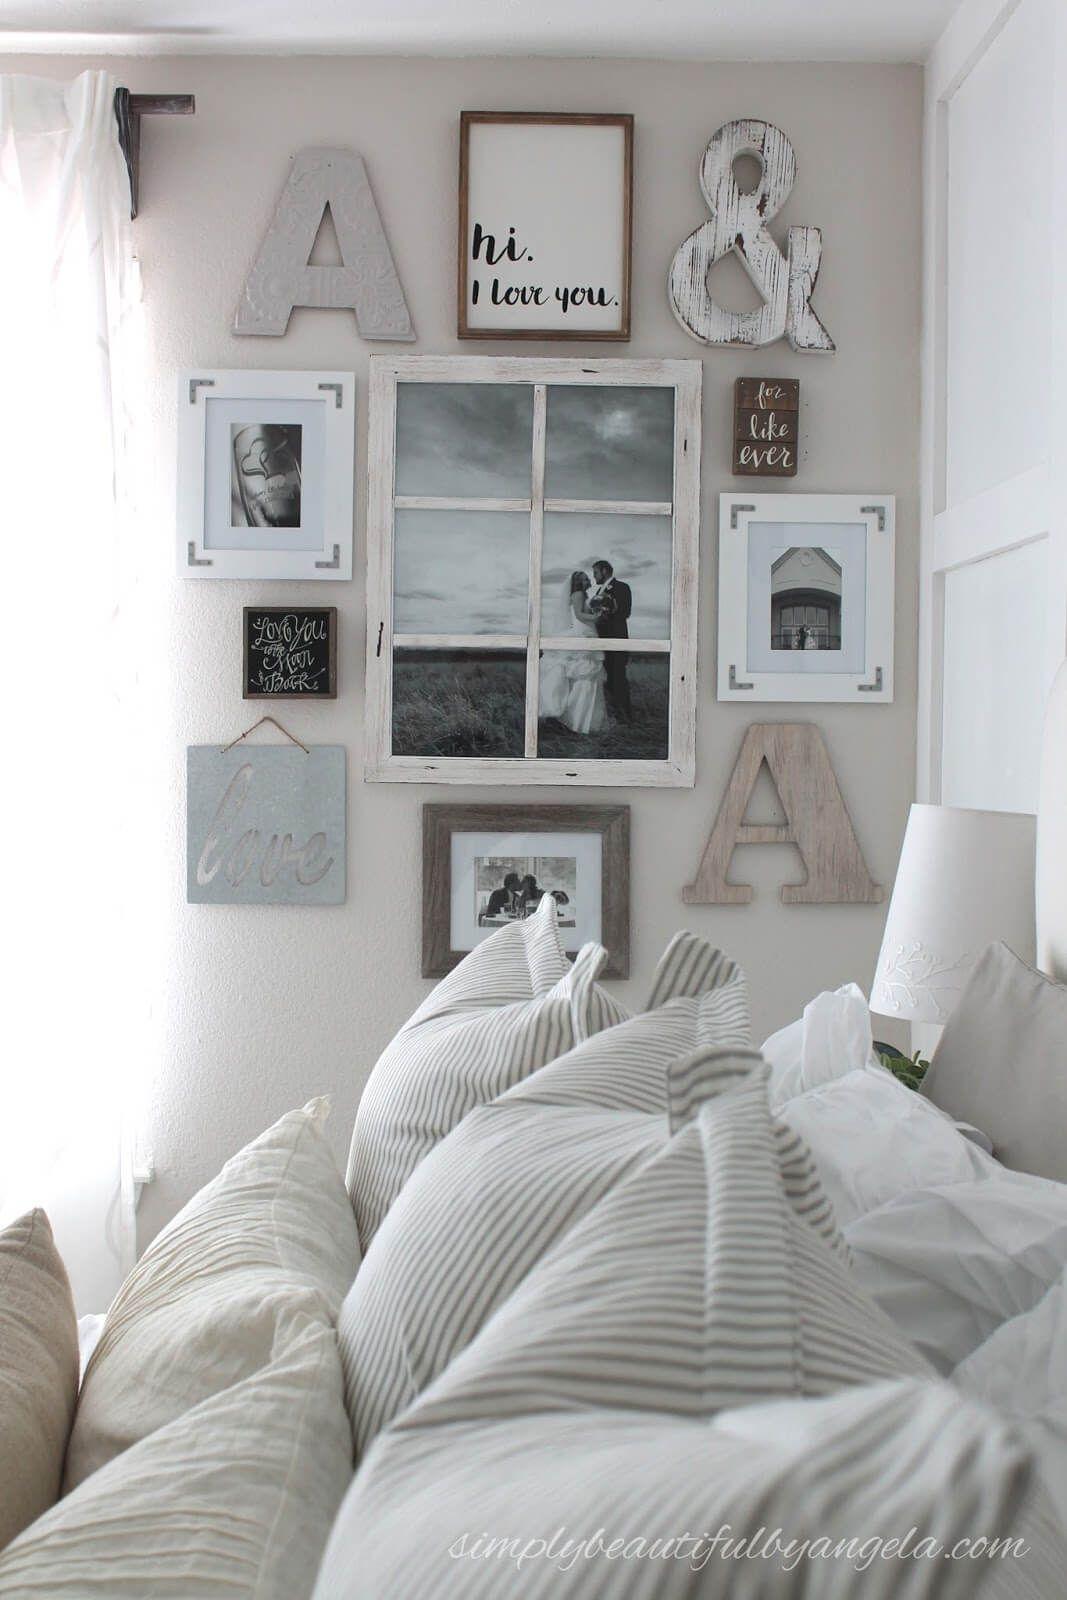 idee per parete dietro al letto. 25 Classy Bedroom Wall Decor Ideas To Style Up Your Space Master Bedroom Makeover Master Bedrooms Decor Remodel Bedroom